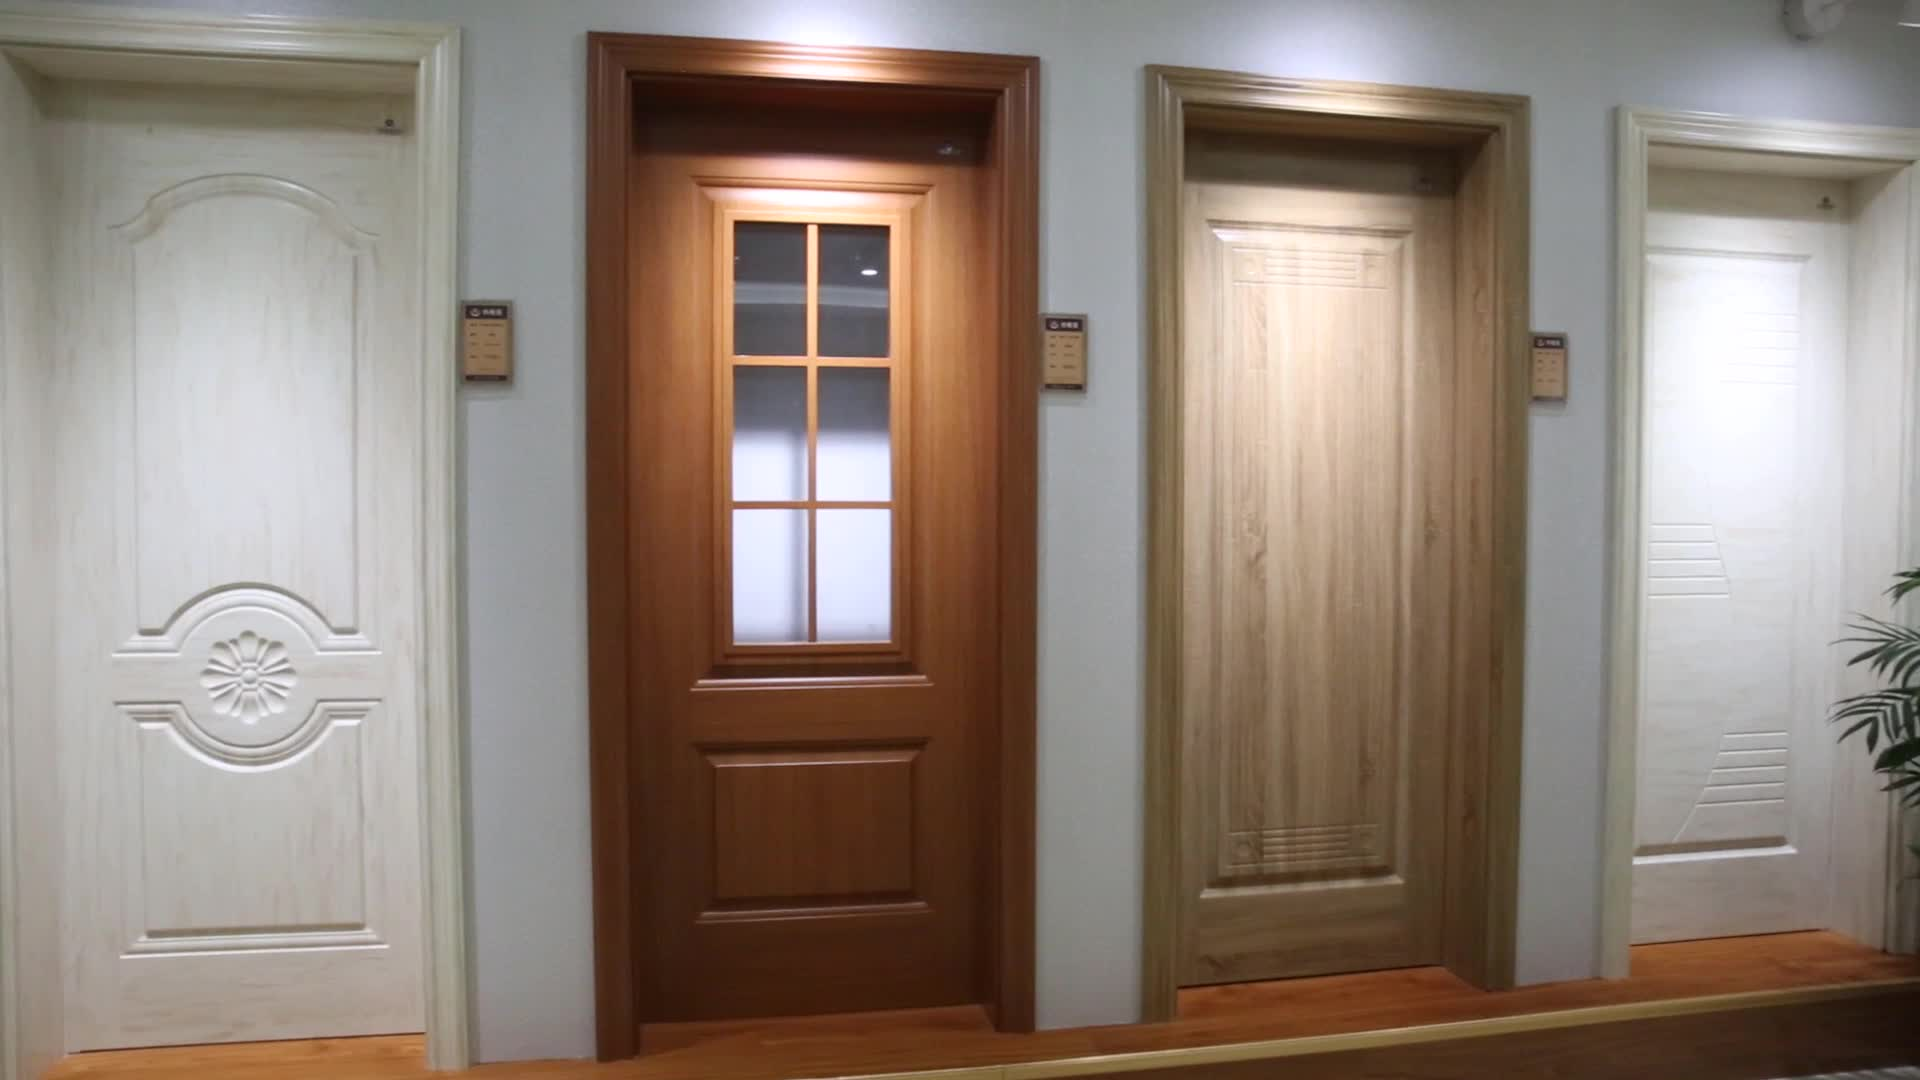 Cheap Latest Design Composite Interior Bamboo Wooden Room Doors